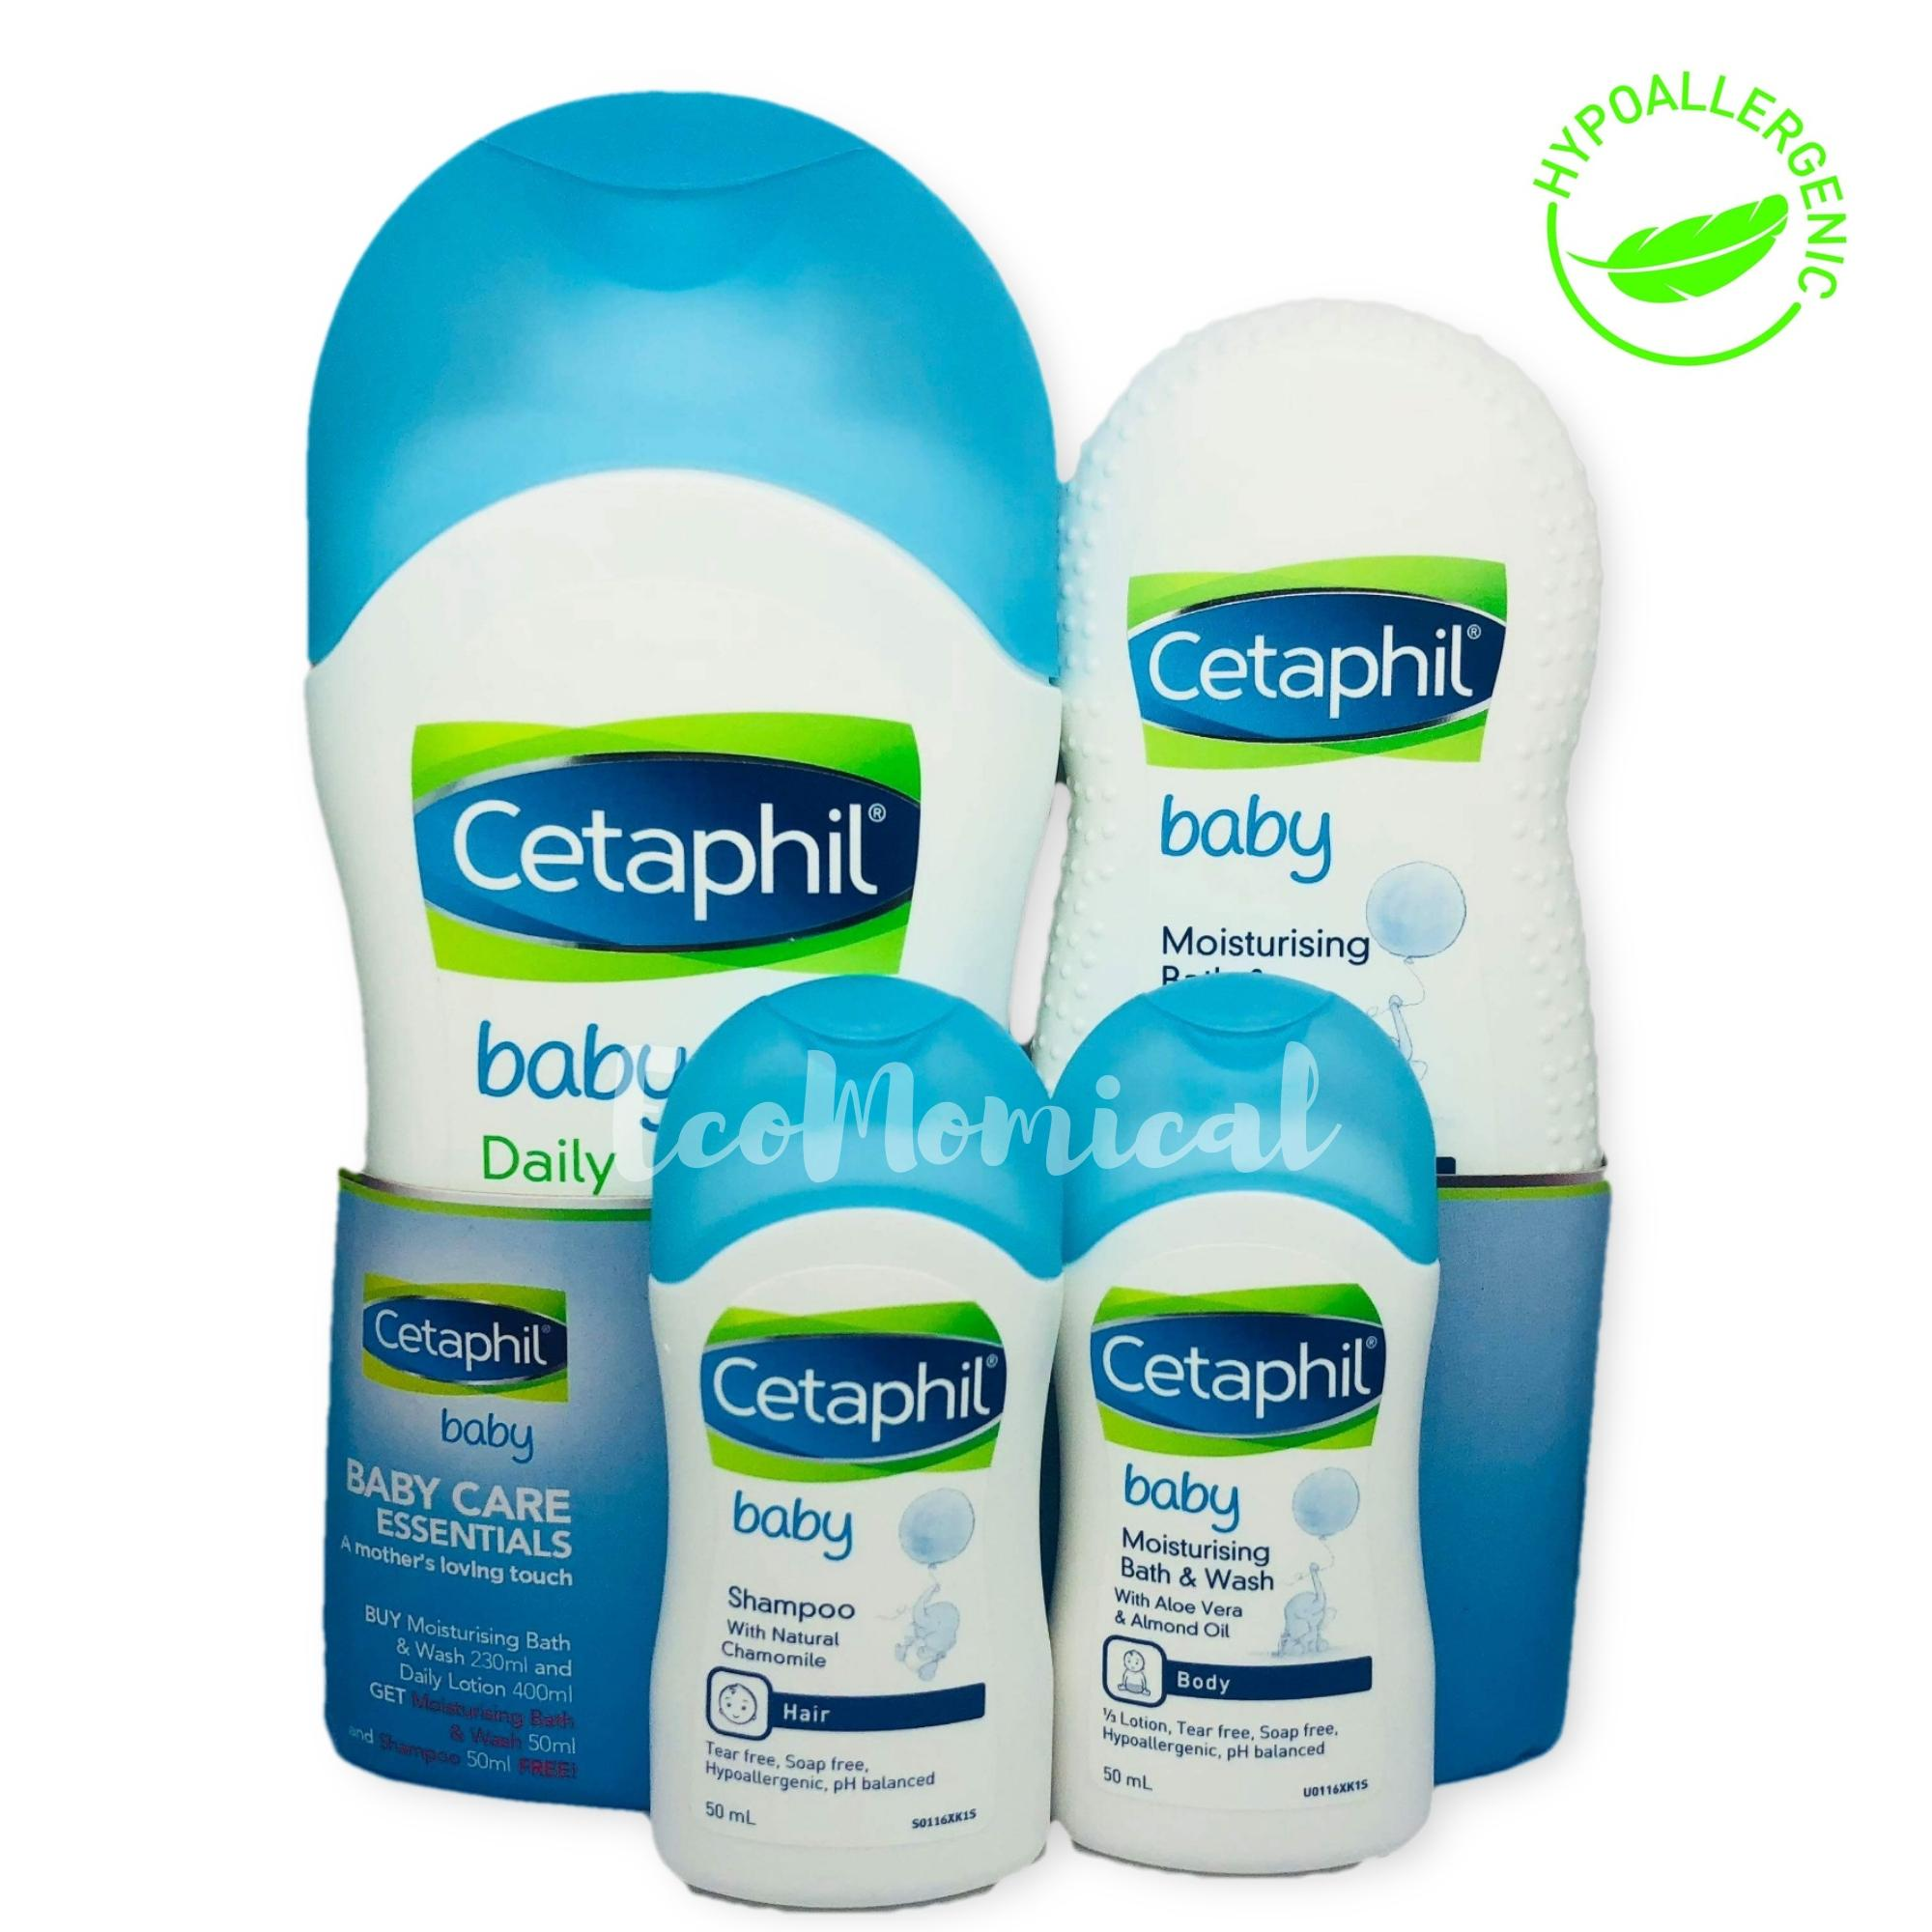 Latest Cetaphil Products Up To 70 Off Lazada Philippines Moisturizing Cream Face Ampamp Body Baby Promo Set 4 Item